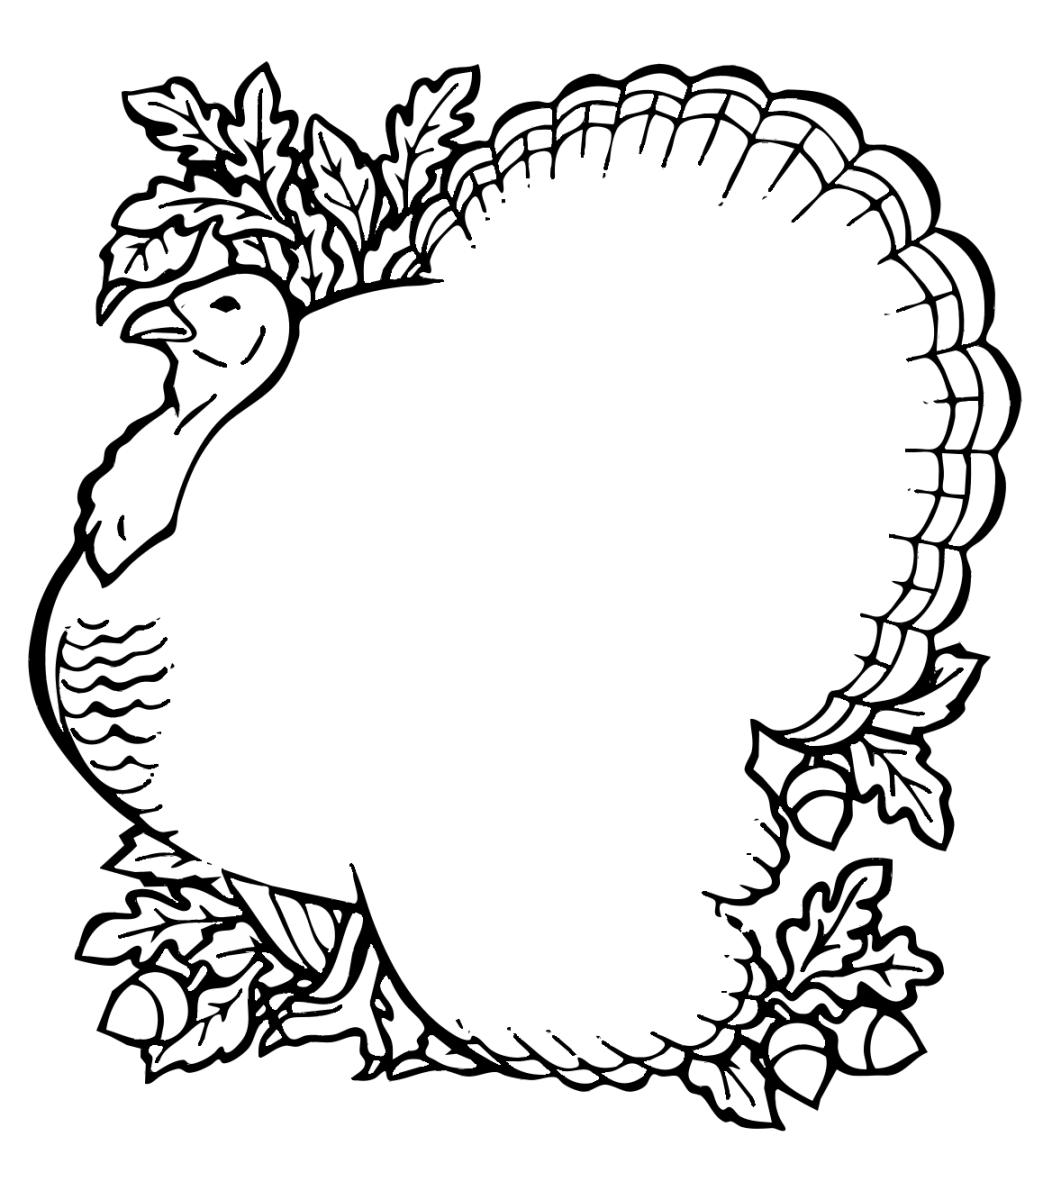 Free Free Thanksgiving Graphics, Download Free Clip Art, Free Clip - Free Printable Thanksgiving Graphics